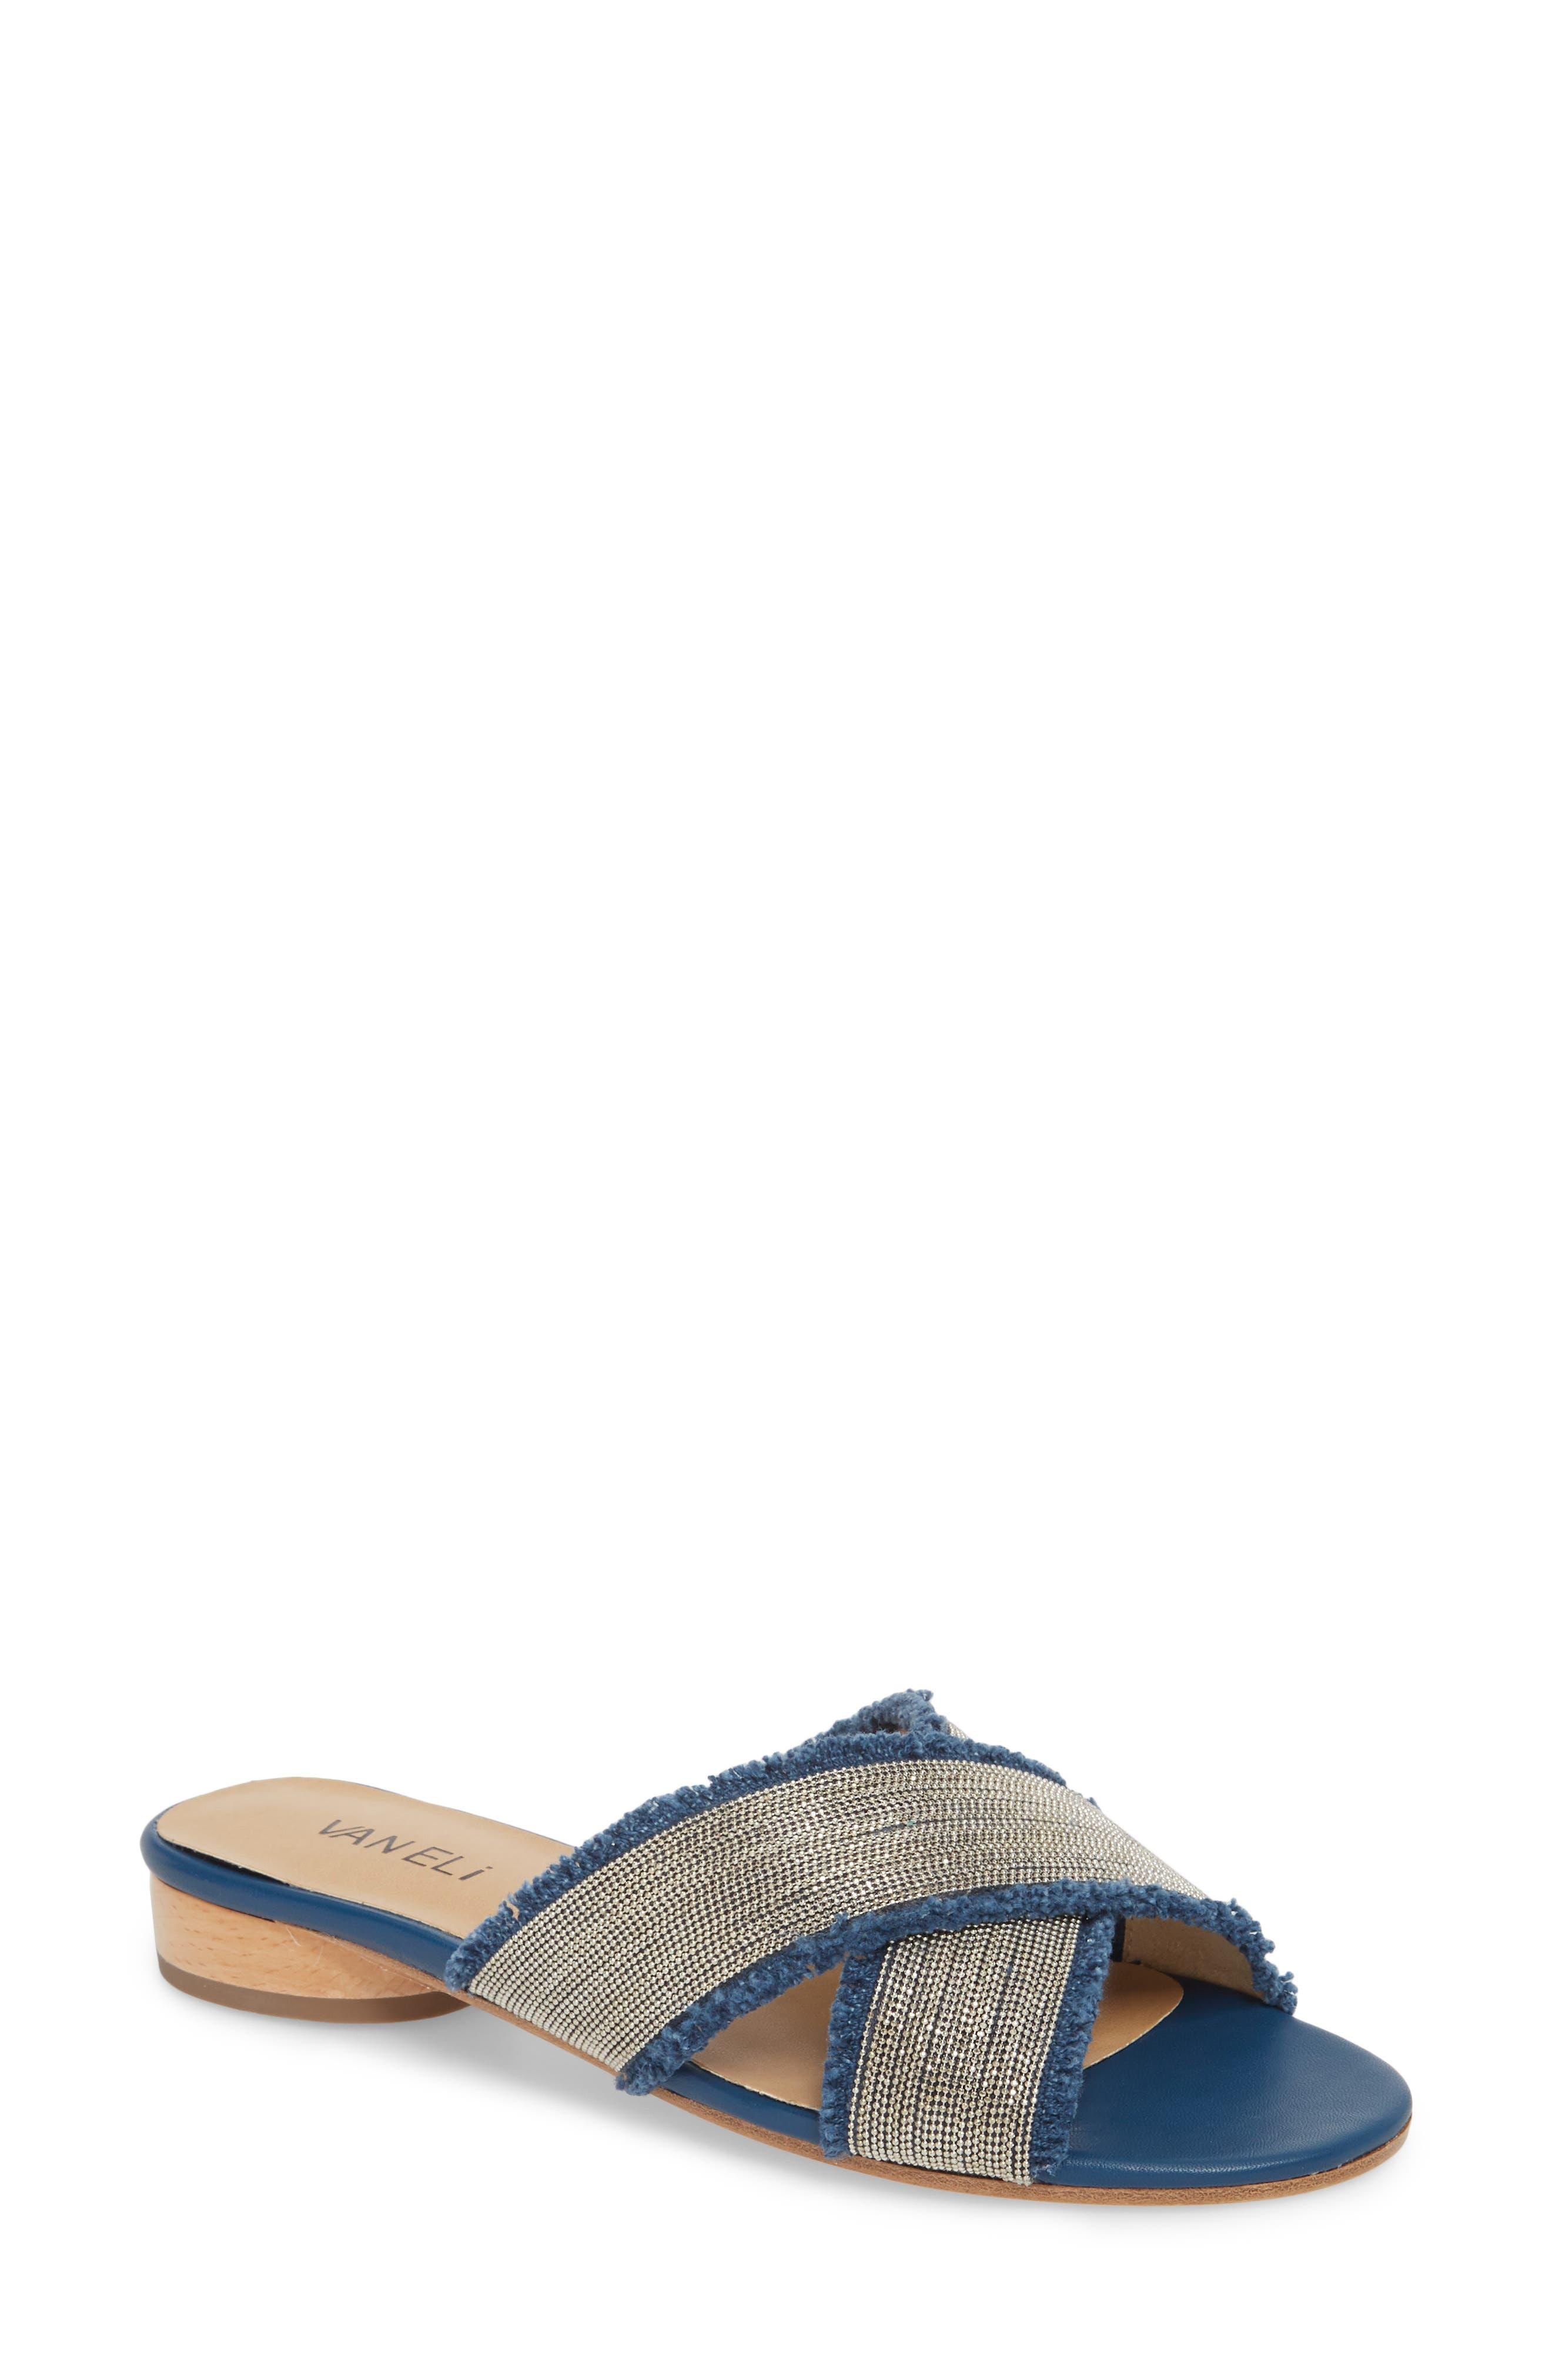 Baret Embellished Cross Strap Slide Sandal,                             Main thumbnail 1, color,                             Denim Fabric